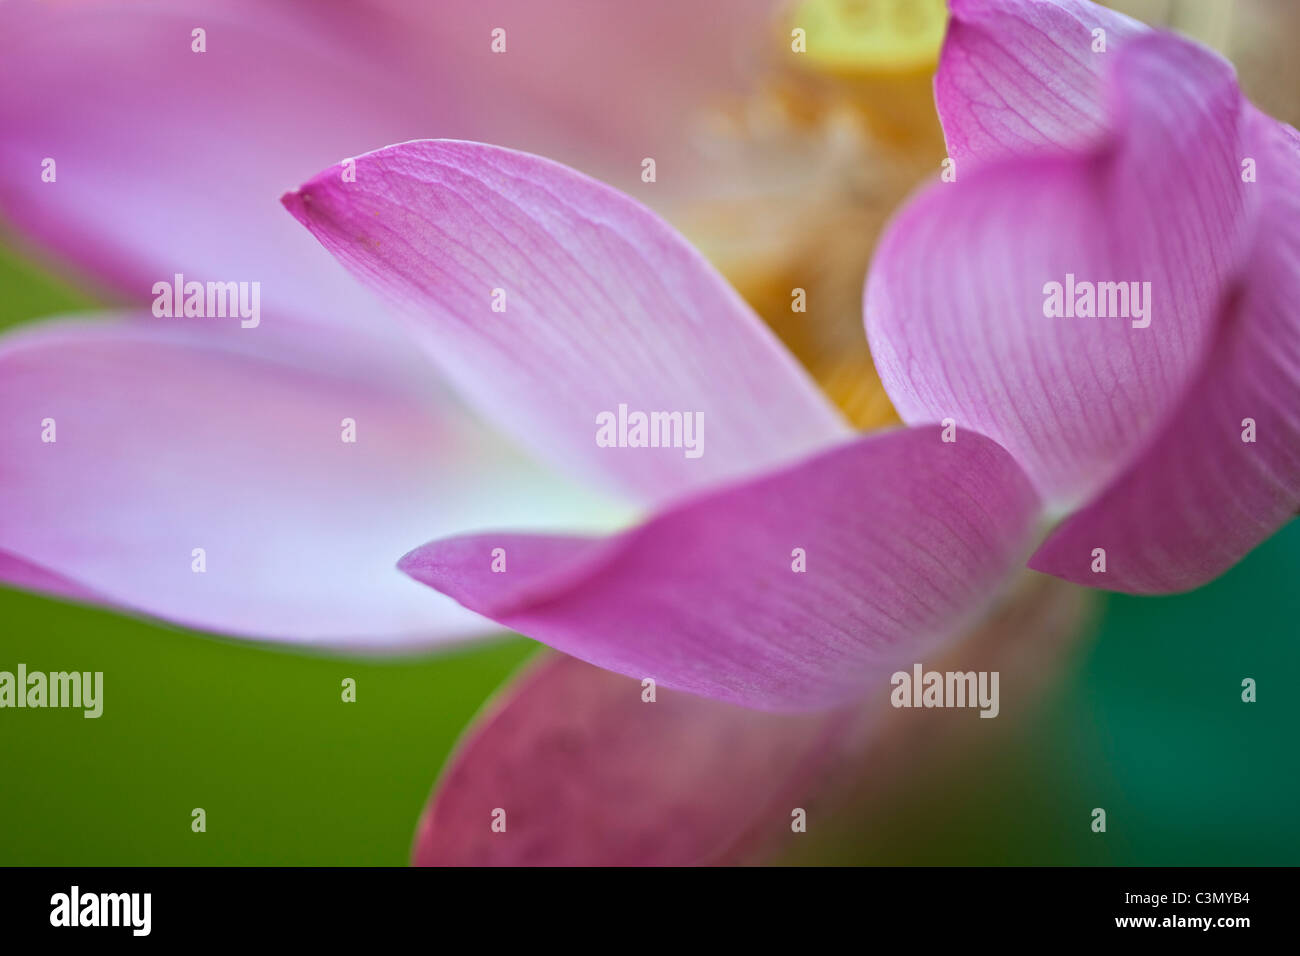 Indonesia, Island Bali, near Tejakula village, Gaia Oasis Resort. Lotus Flower. Stock Photo